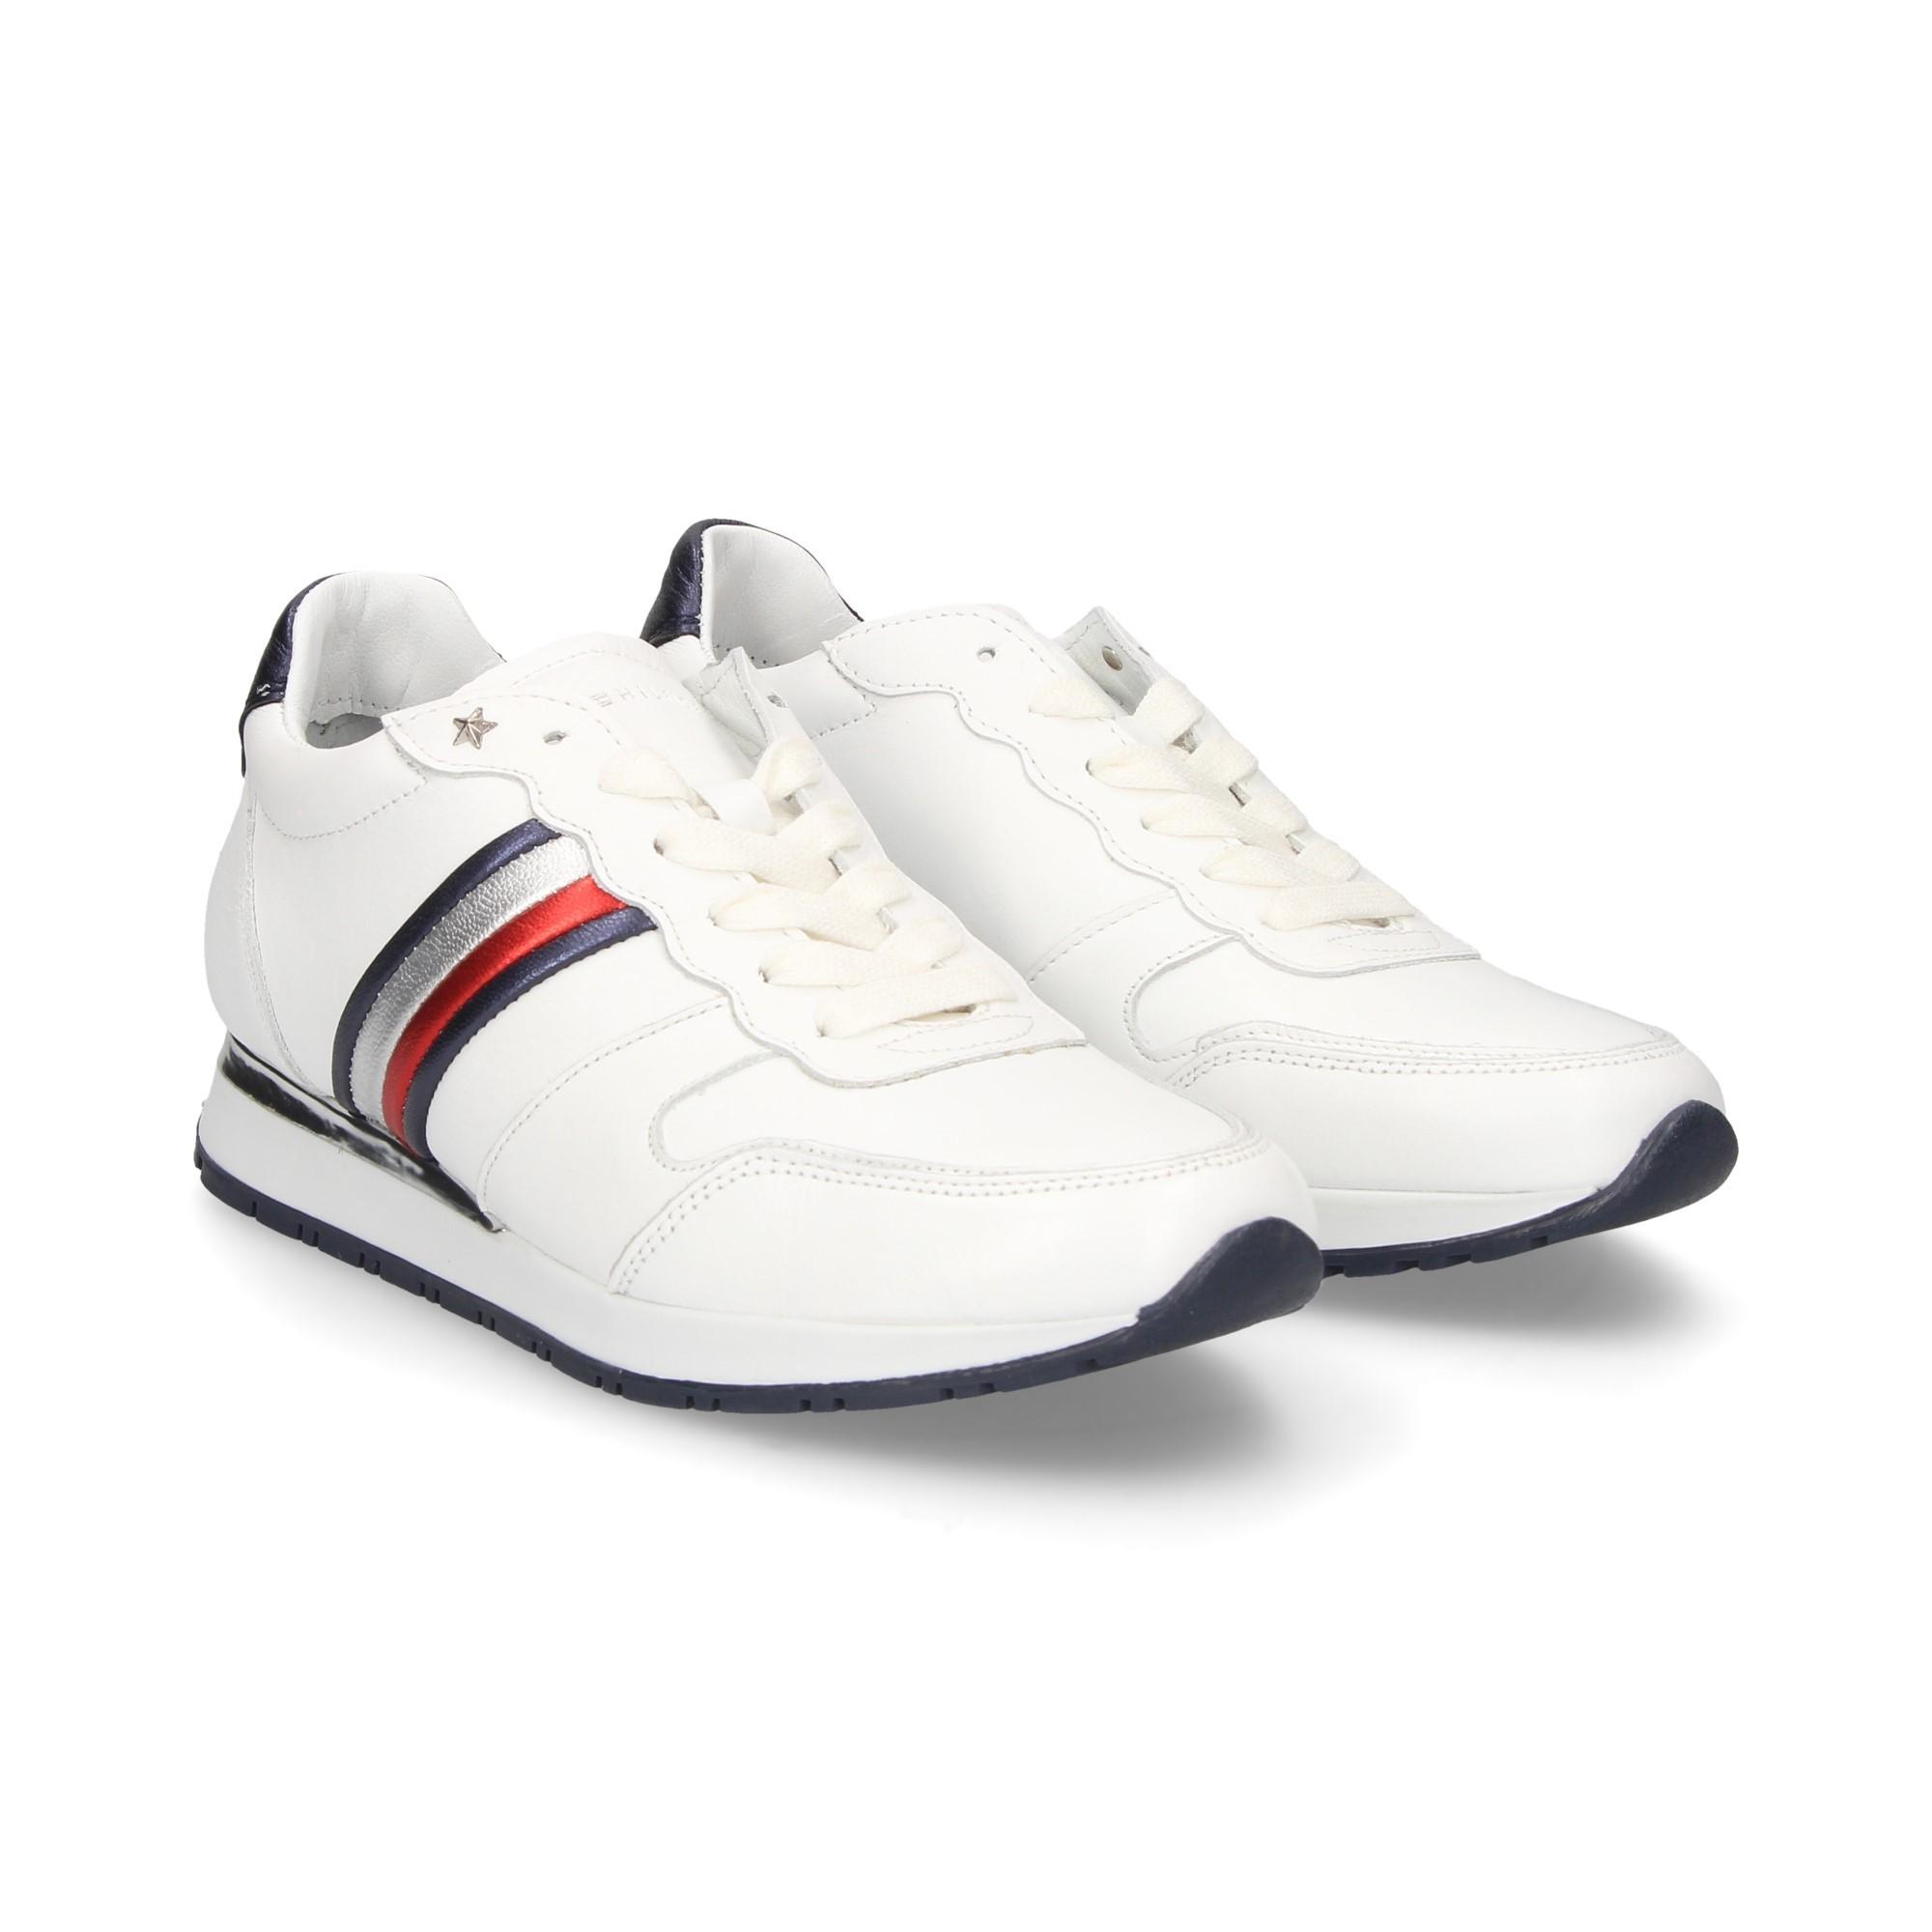 17ec79449ea TOMMY HILFIGER Women's Sneakers FW03227020 RWB